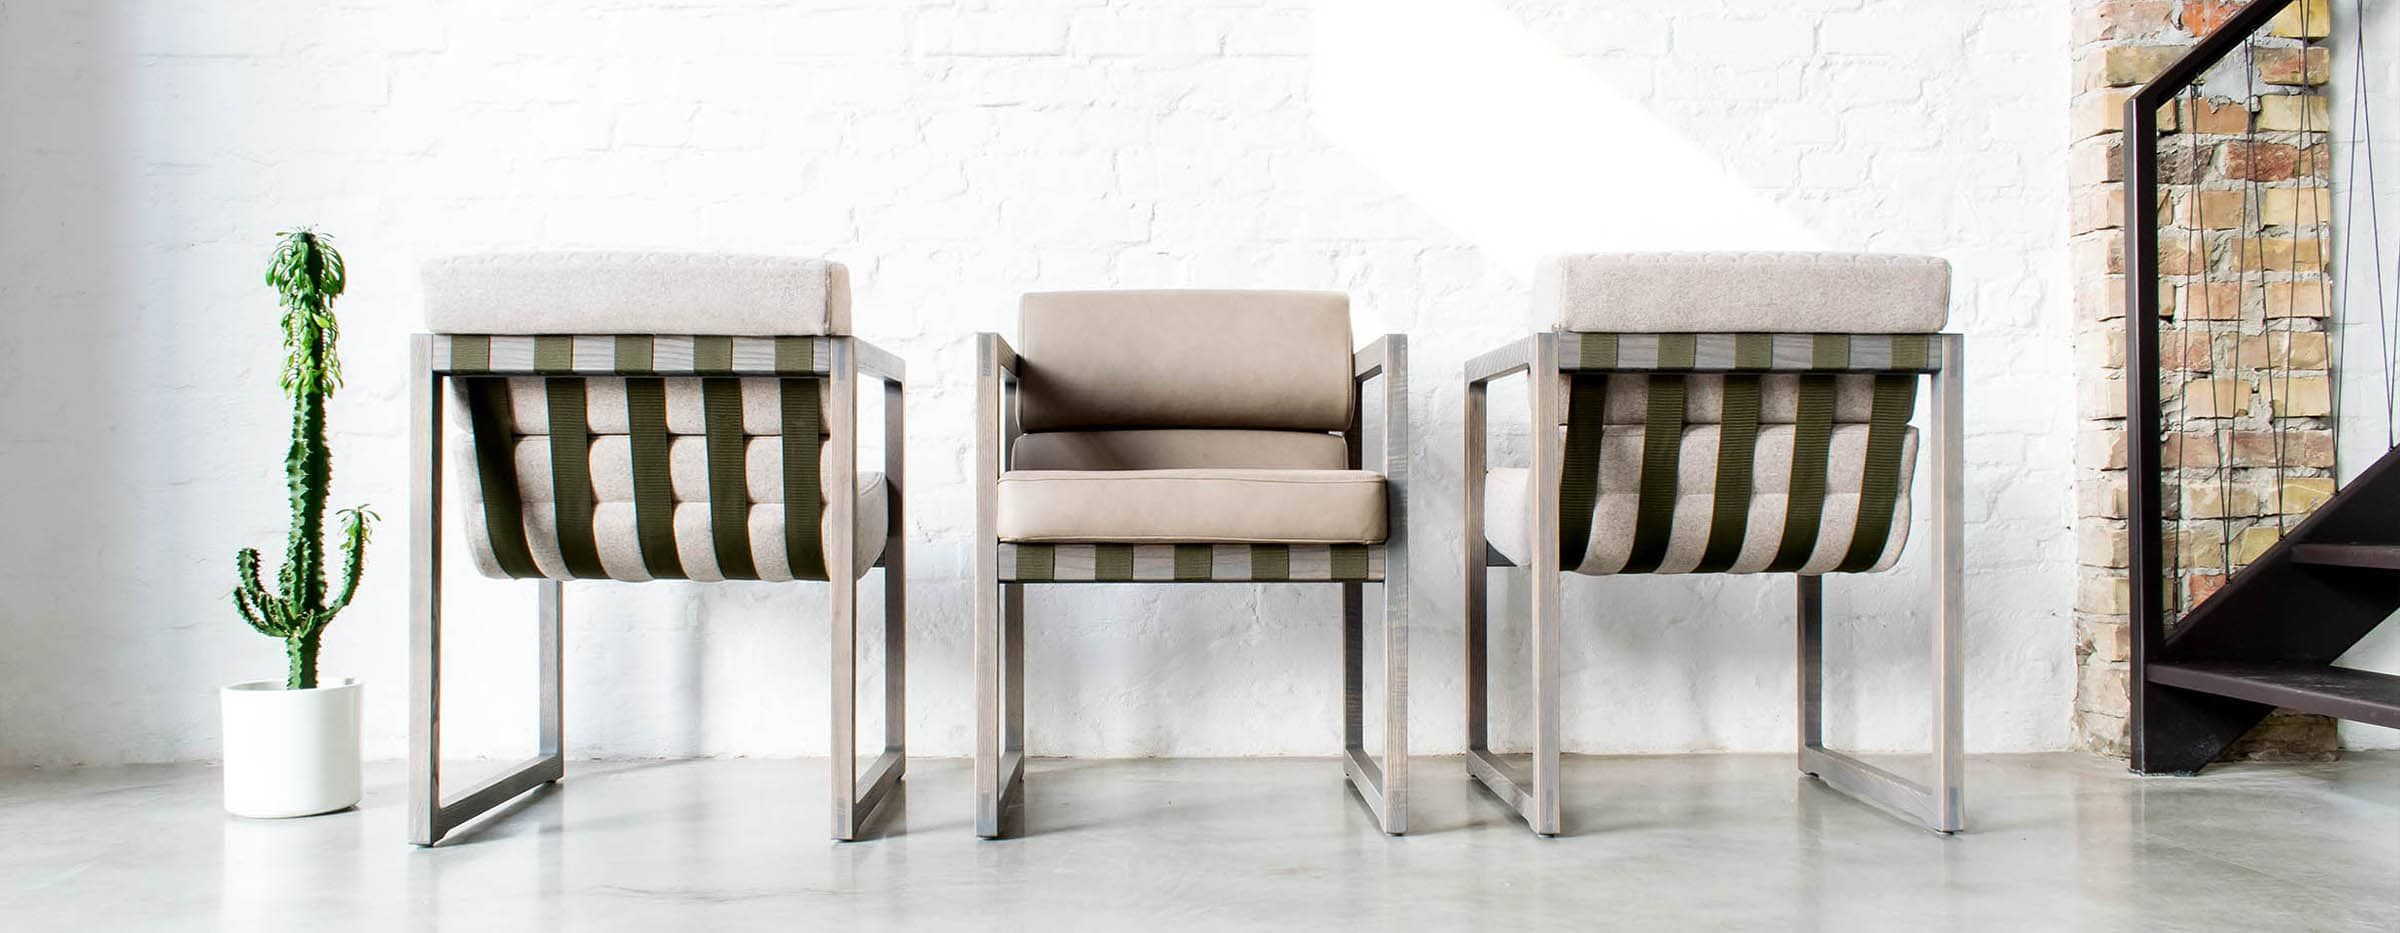 nblogg, skandinavisch, sessel, leder, leather, stuhl, sitzmöbel, designer sitzmöbel, designer stuhl, holz, massivholz, mbzwo, mb zwo, design